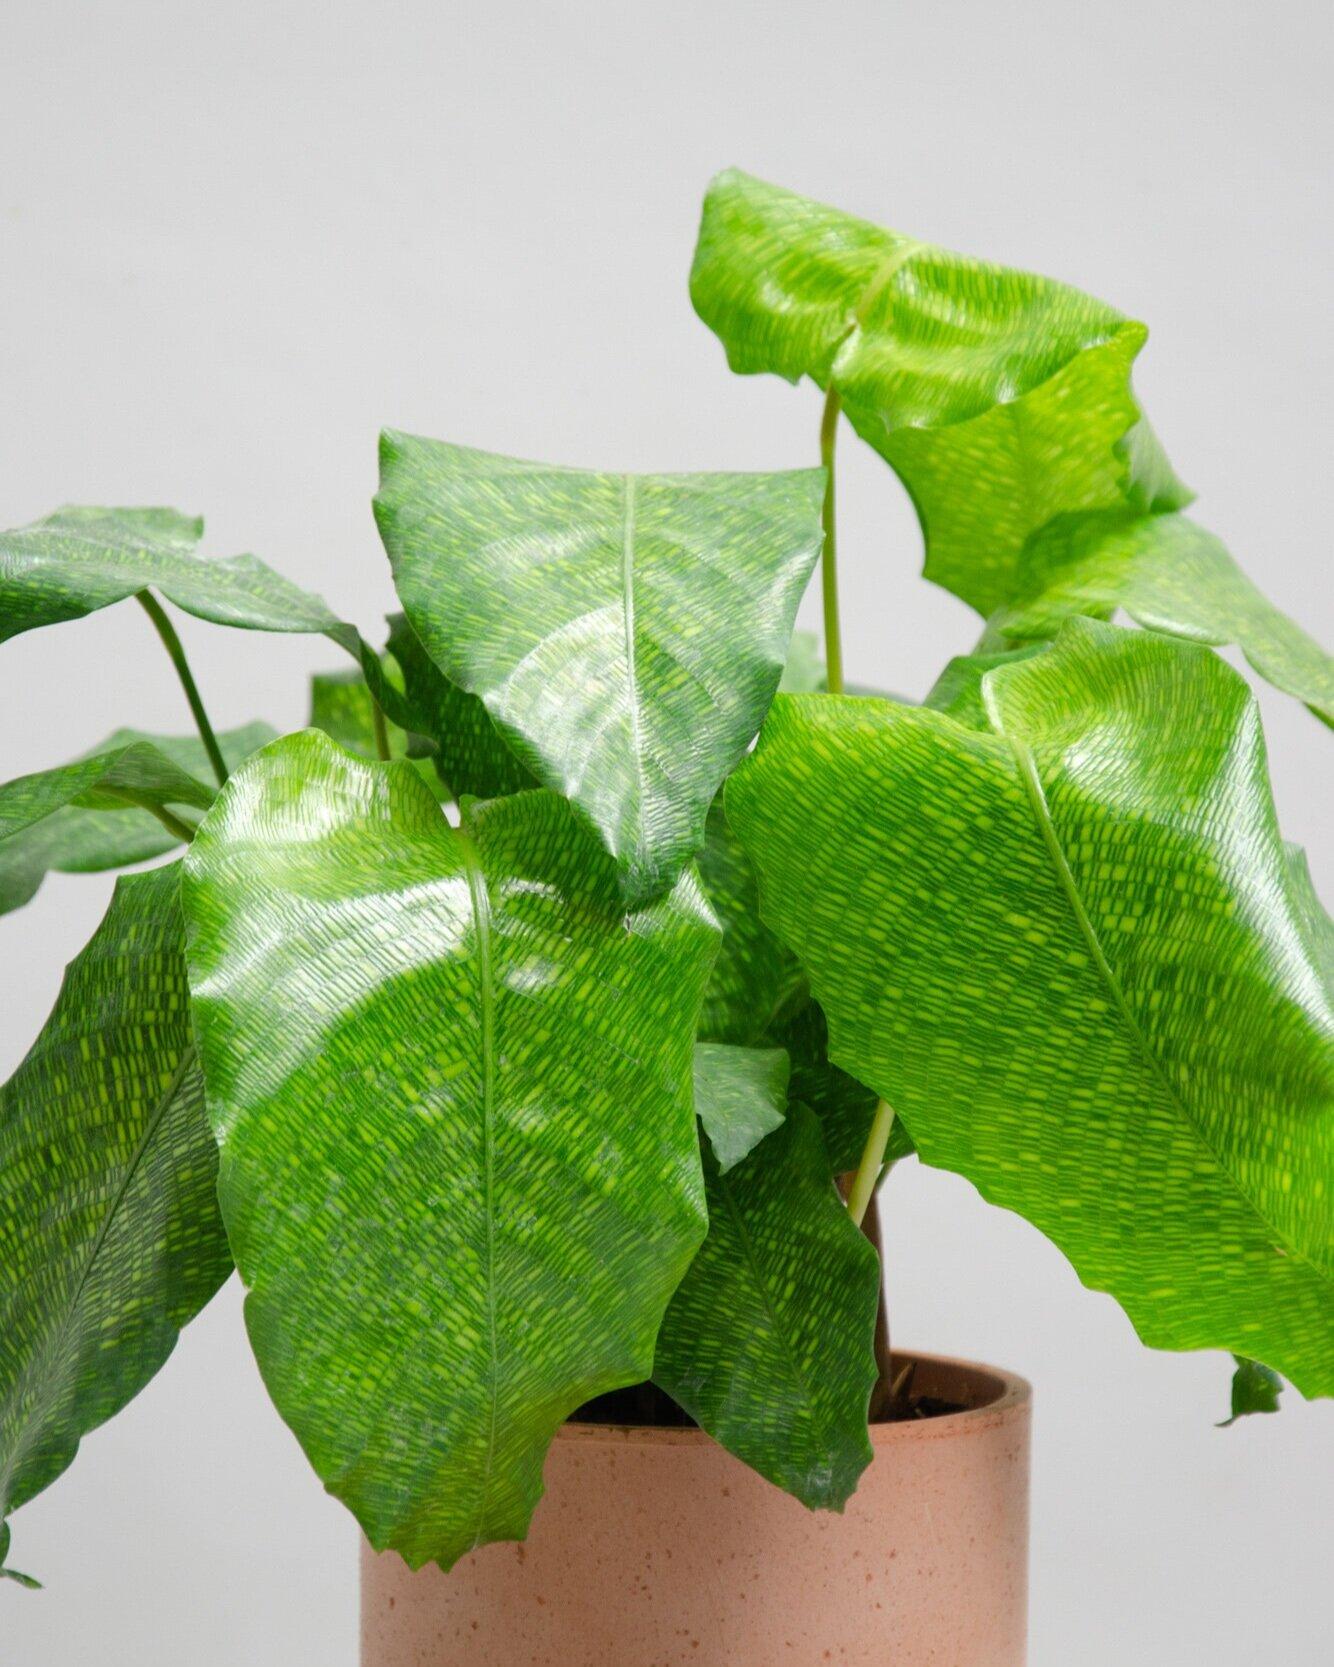 Calathea musaica - Calathea 'Network' — IN-TRAY PLANTS